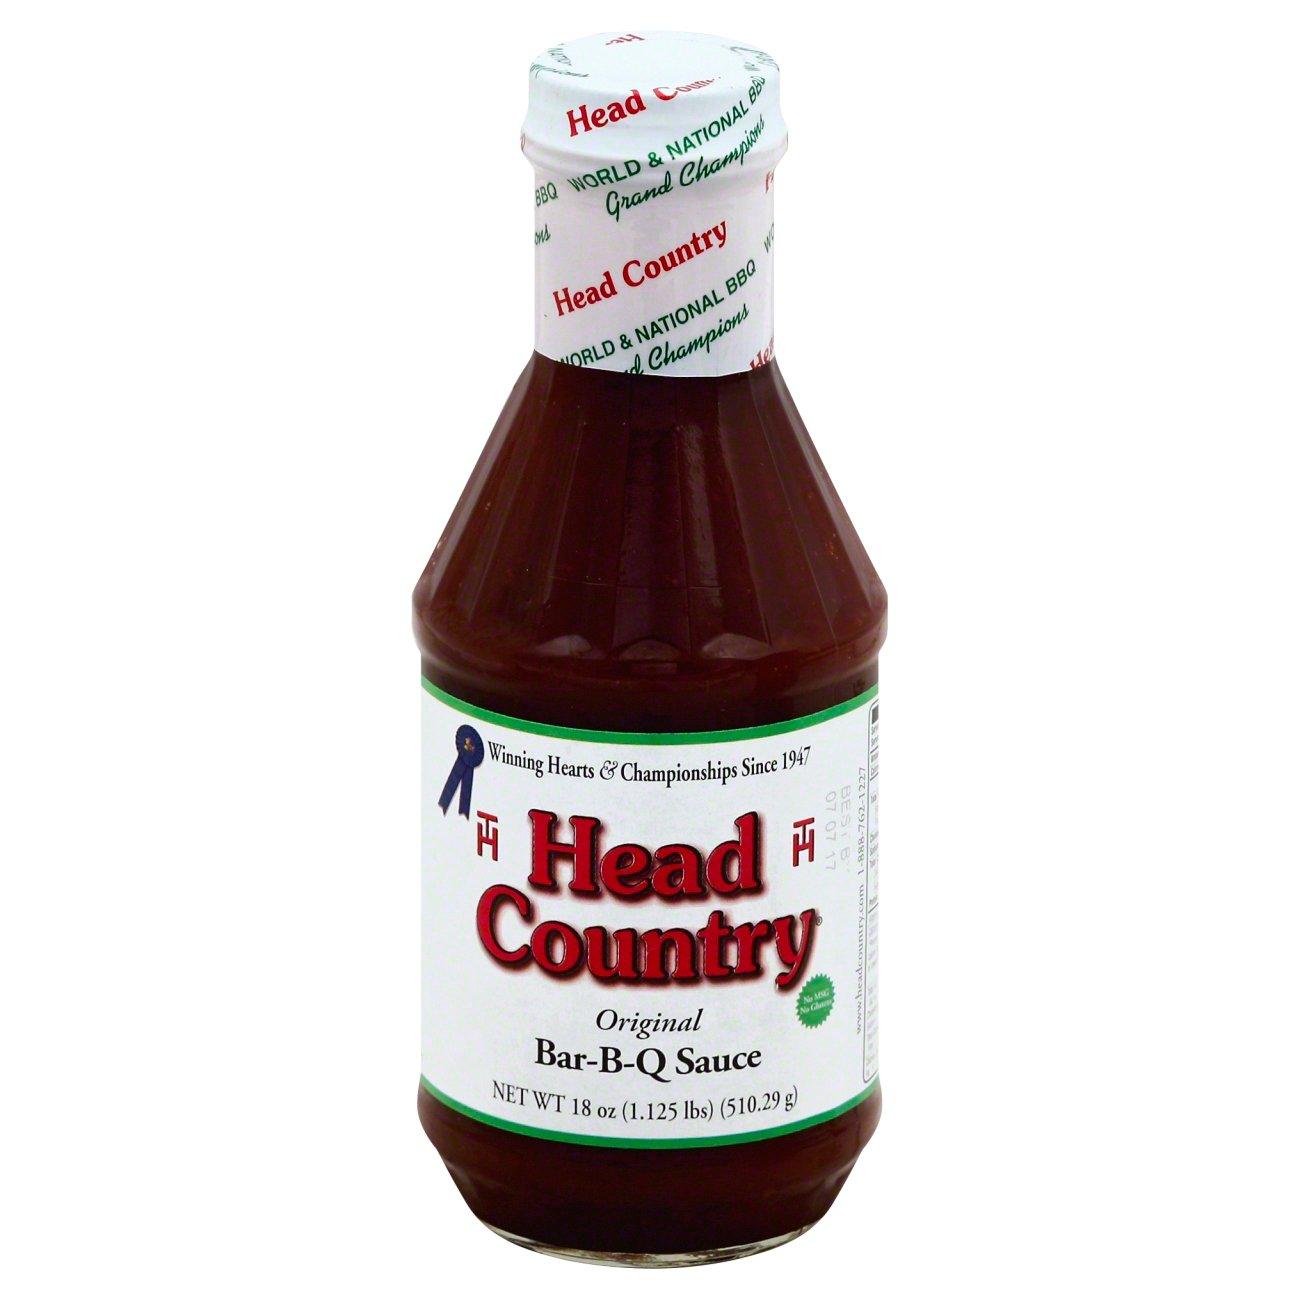 Head Country Original Bar-B-Q Sauce - Shop BBQ Sauce at HEB